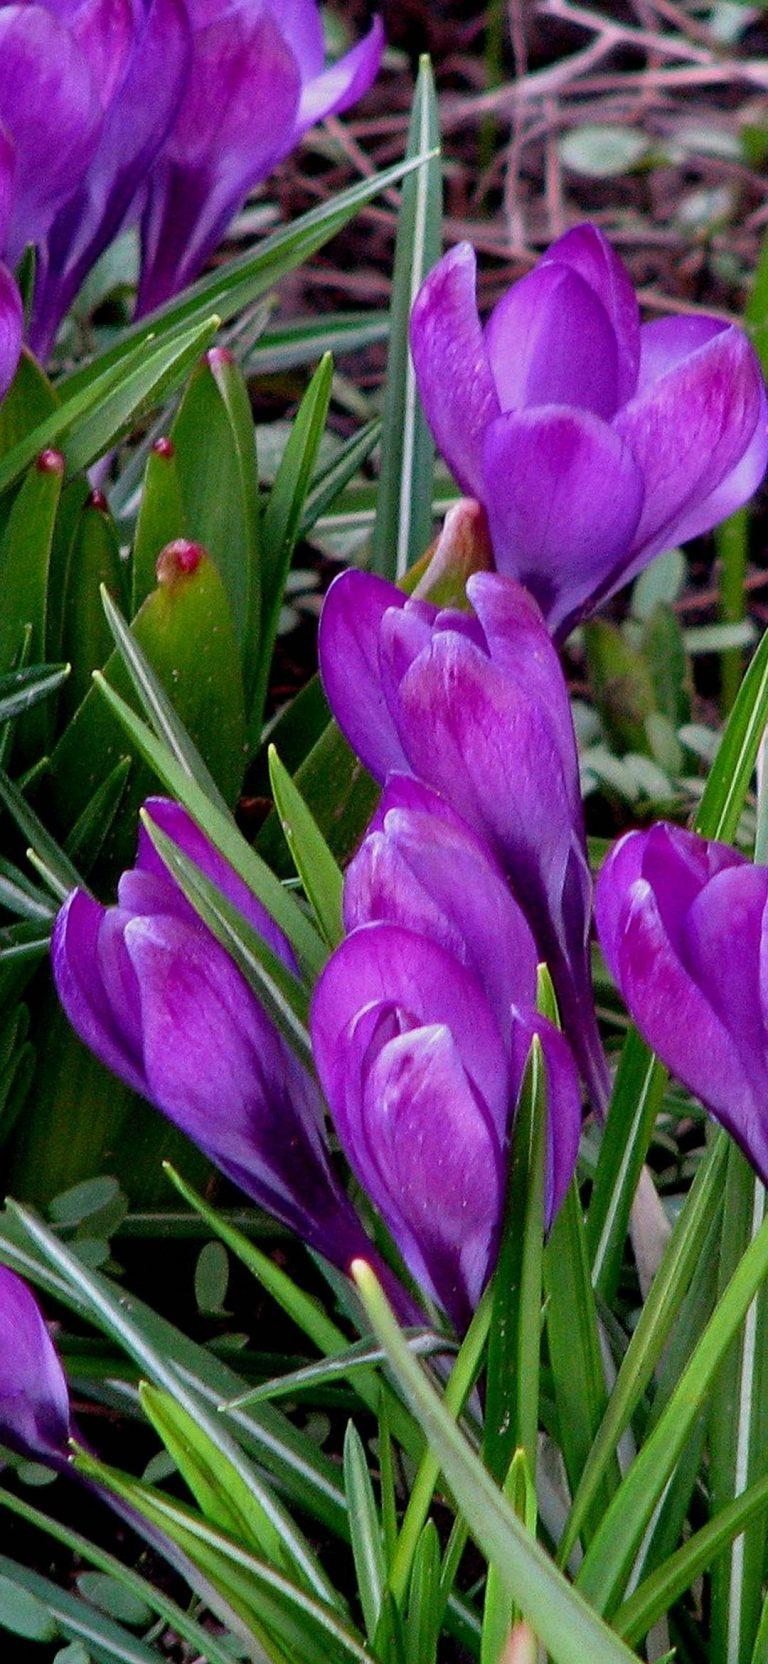 Snowdrops Spring Grass 1080x2340 768x1664